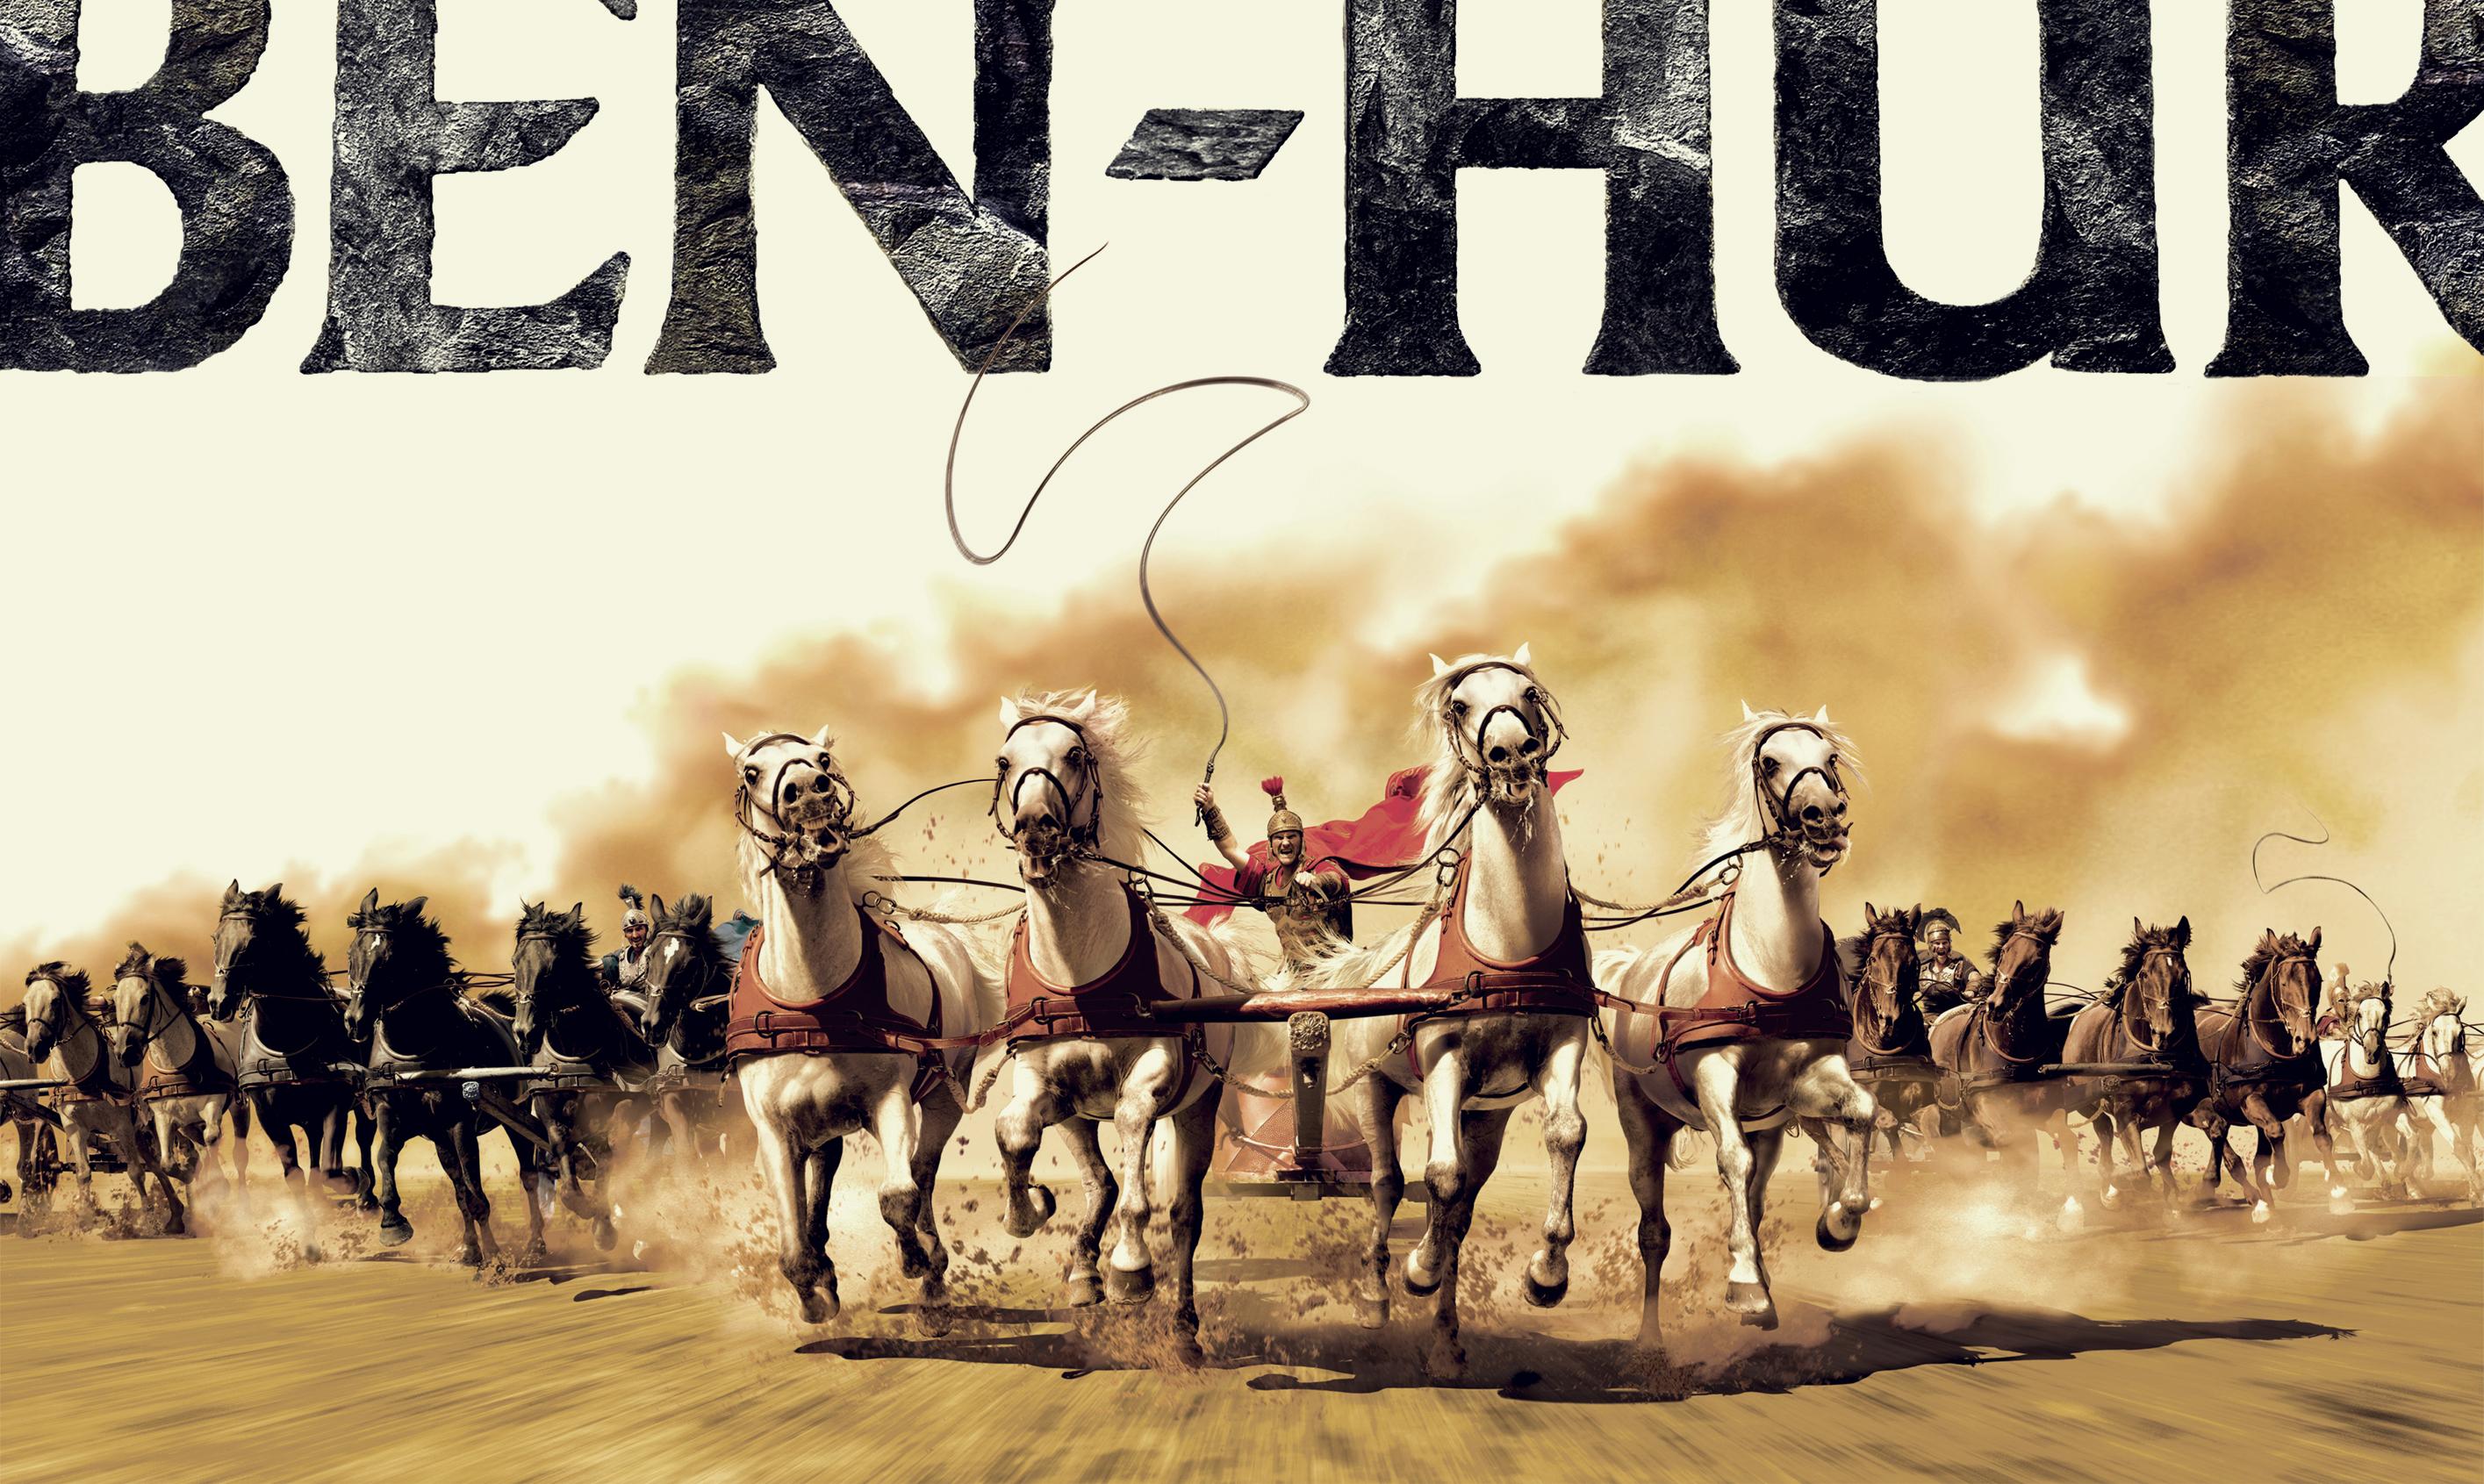 Ben Hur Teaser Poster